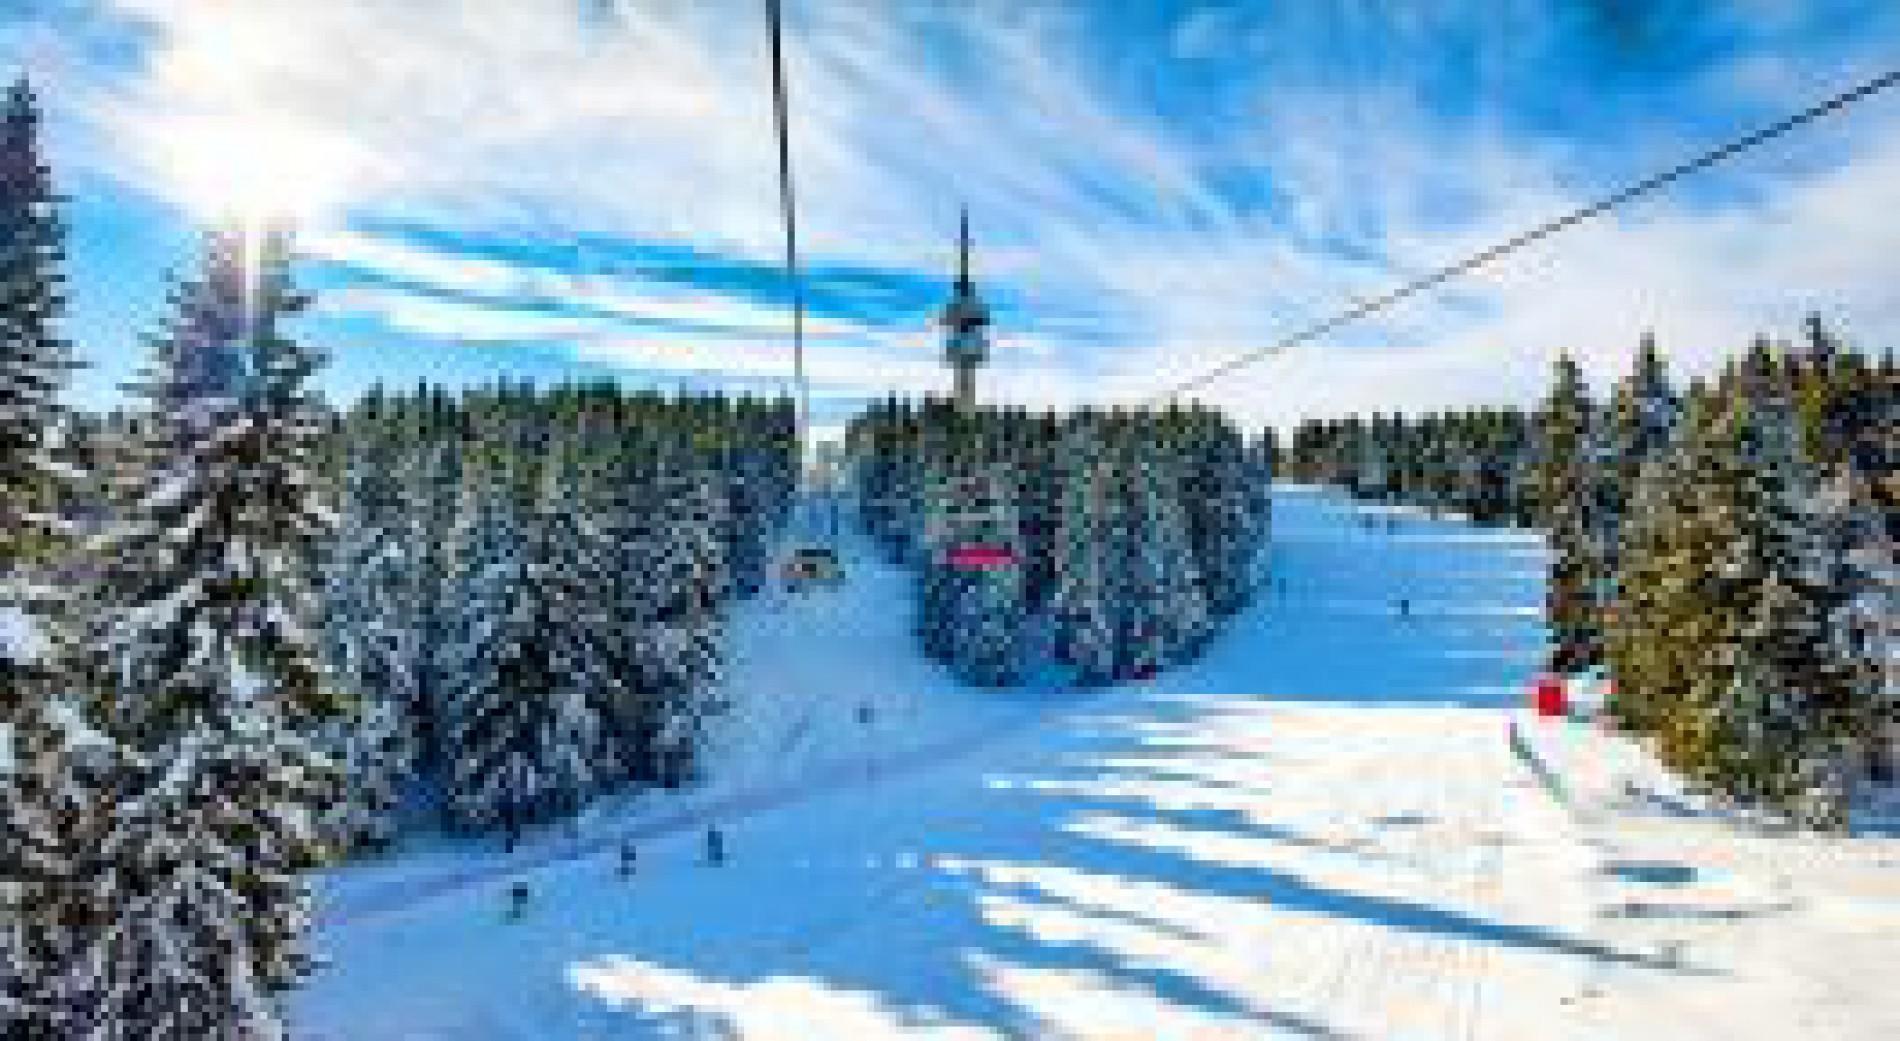 The winter resorts of Bulgaria